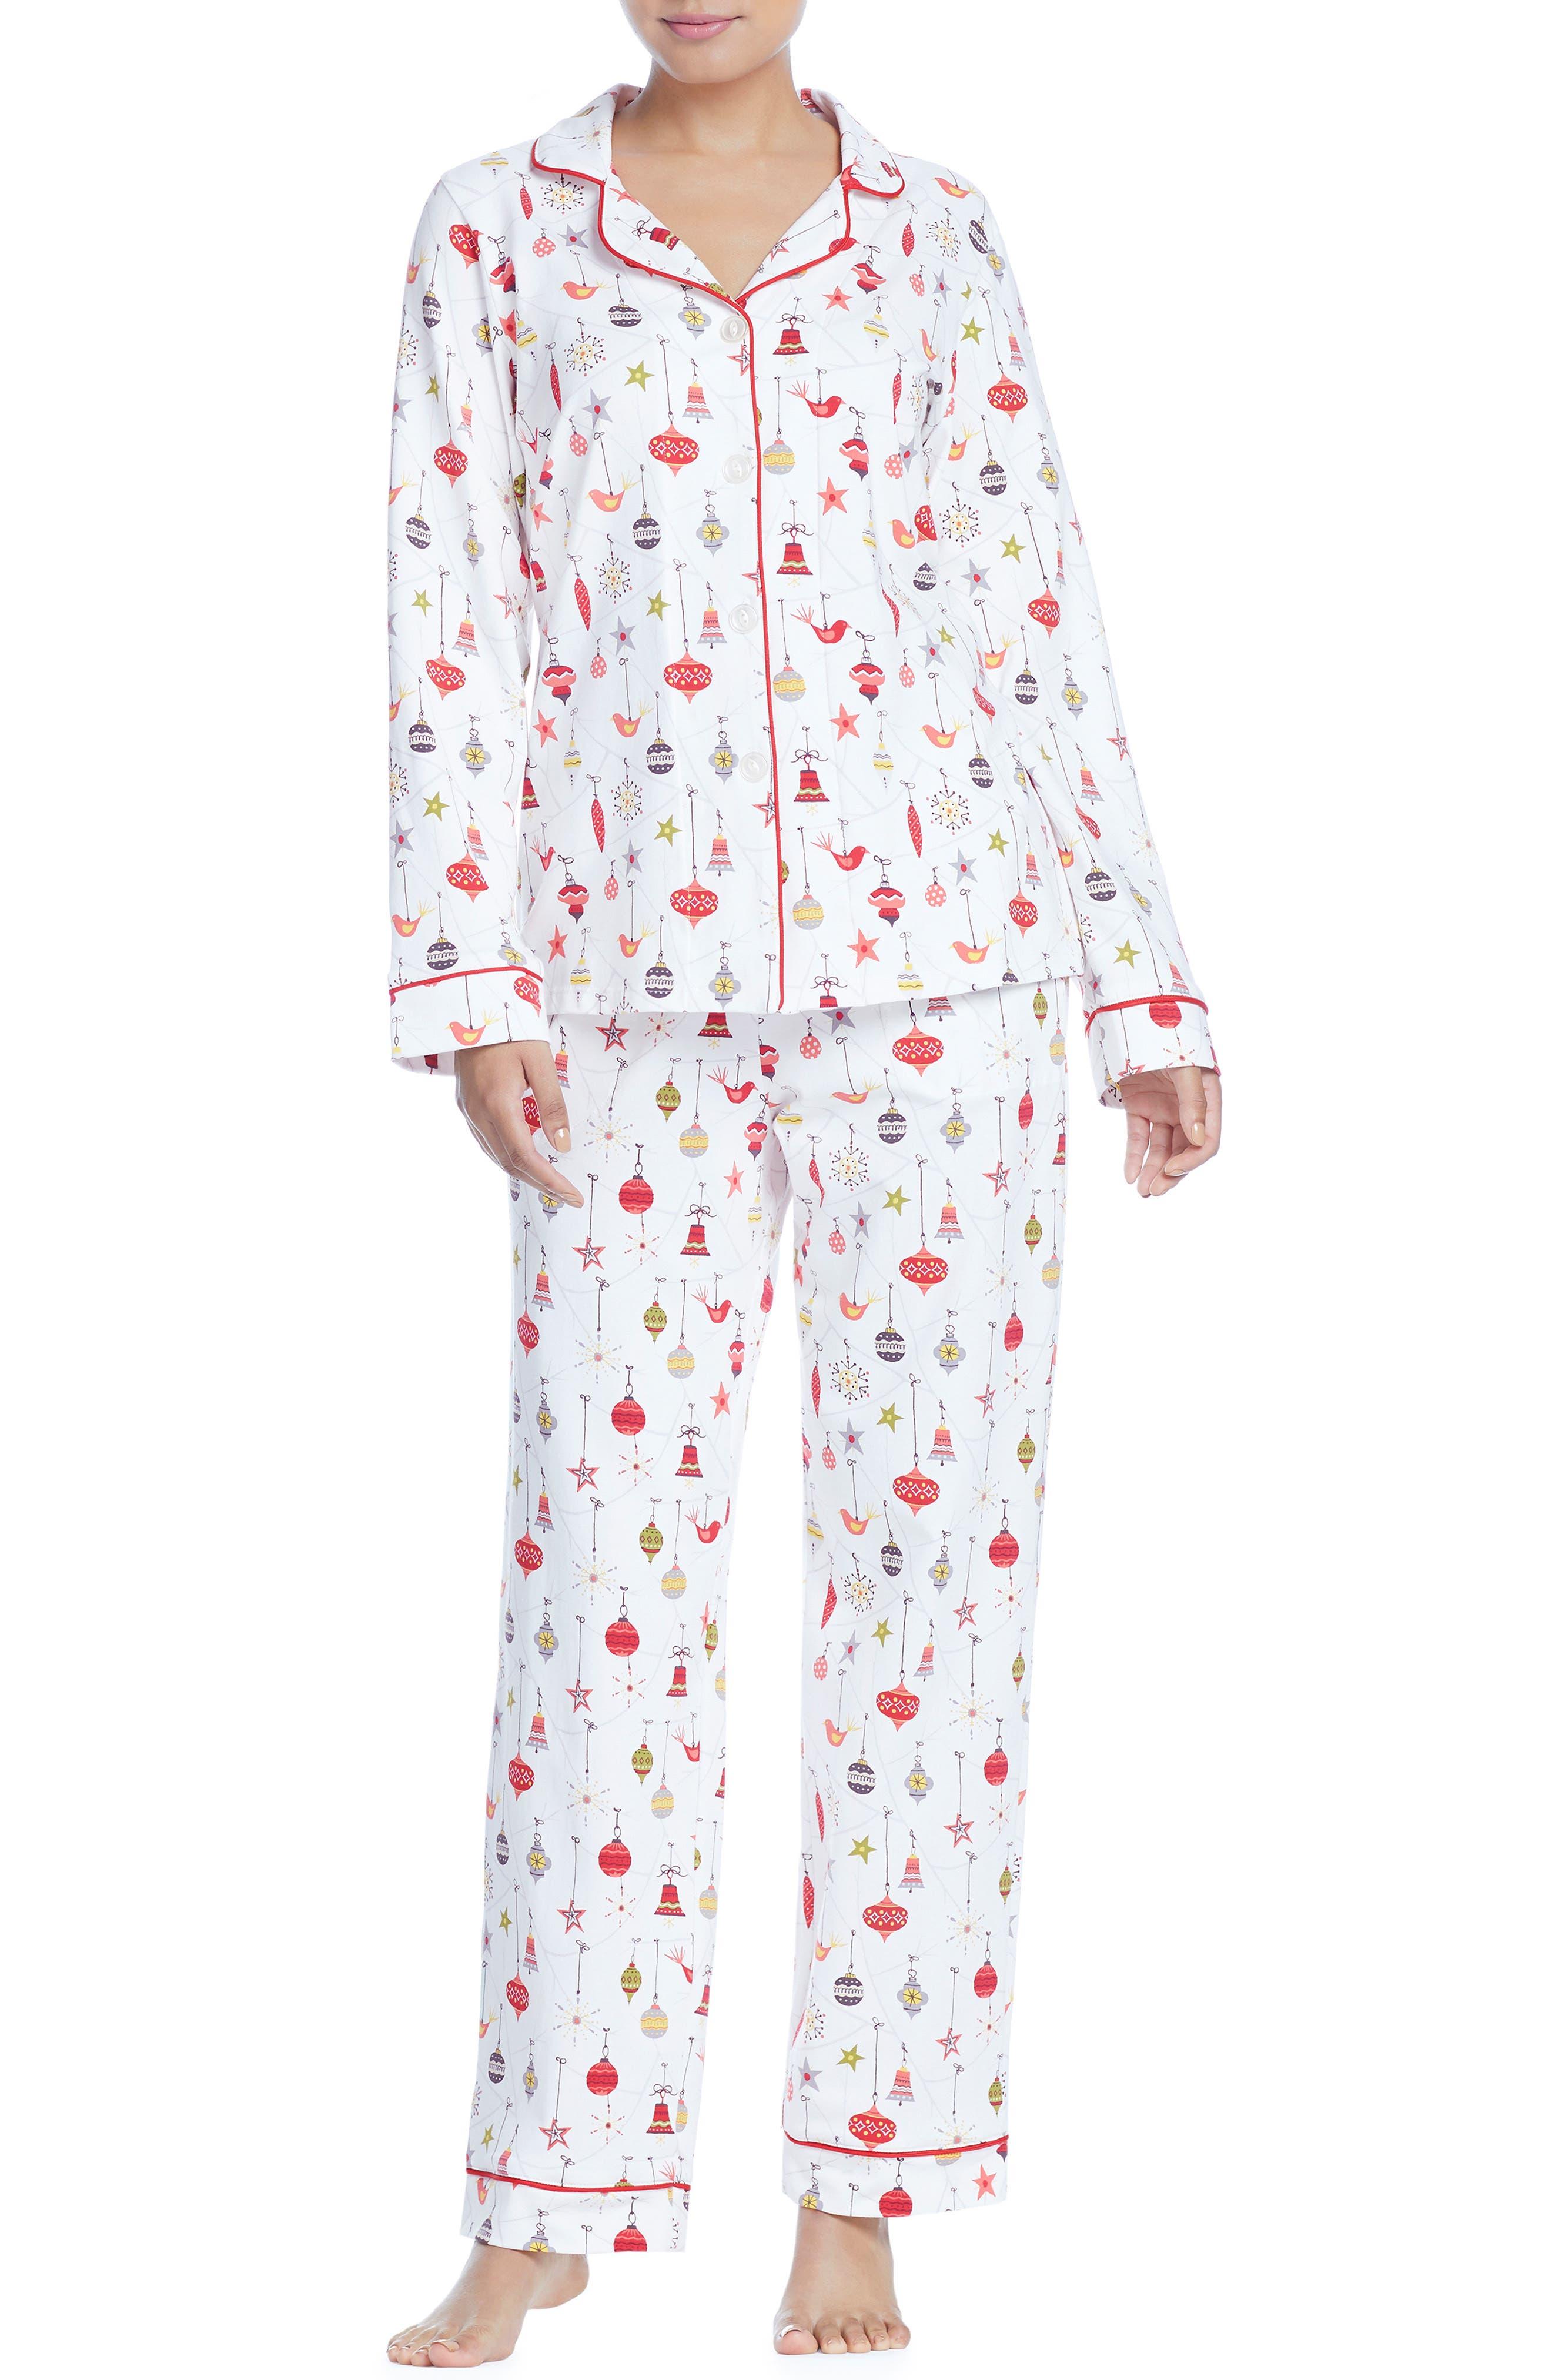 BEDHEAD Classic Print Pajamas in Deck The Halls